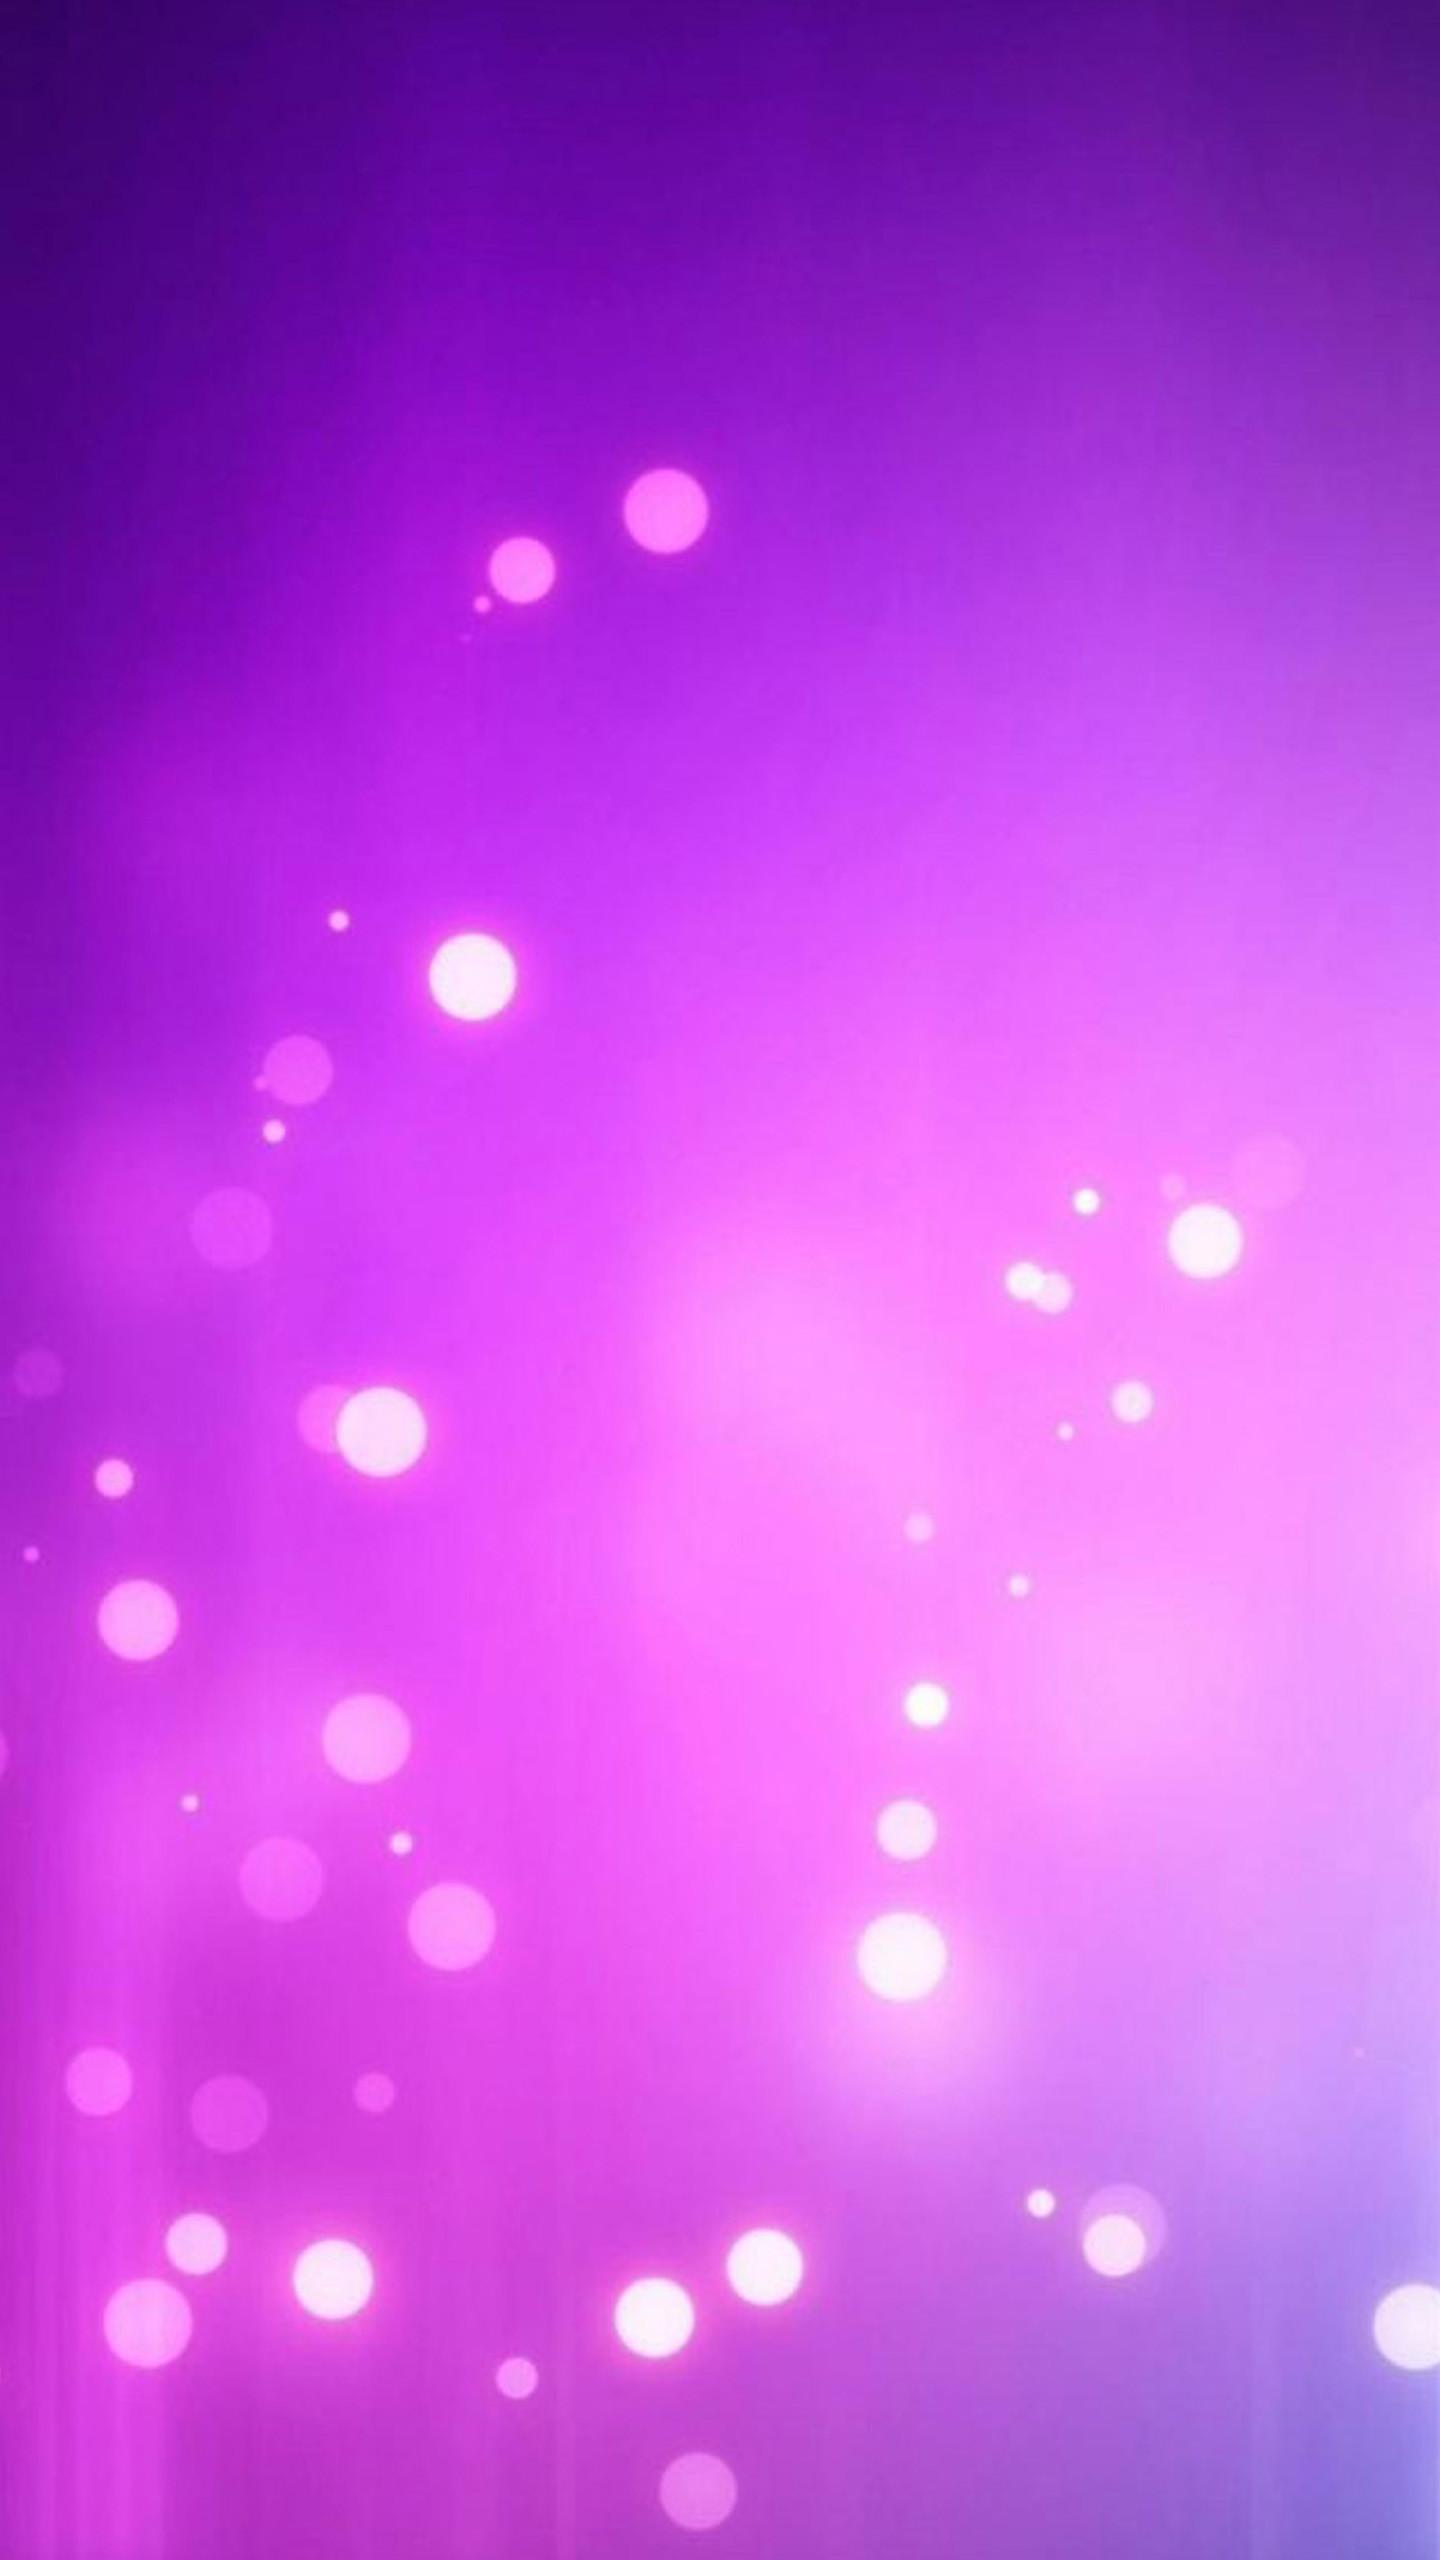 Purple star wallpaper 61 images 1440x2560 purple star nexus 6 wallpapersg 14402560 altavistaventures Images